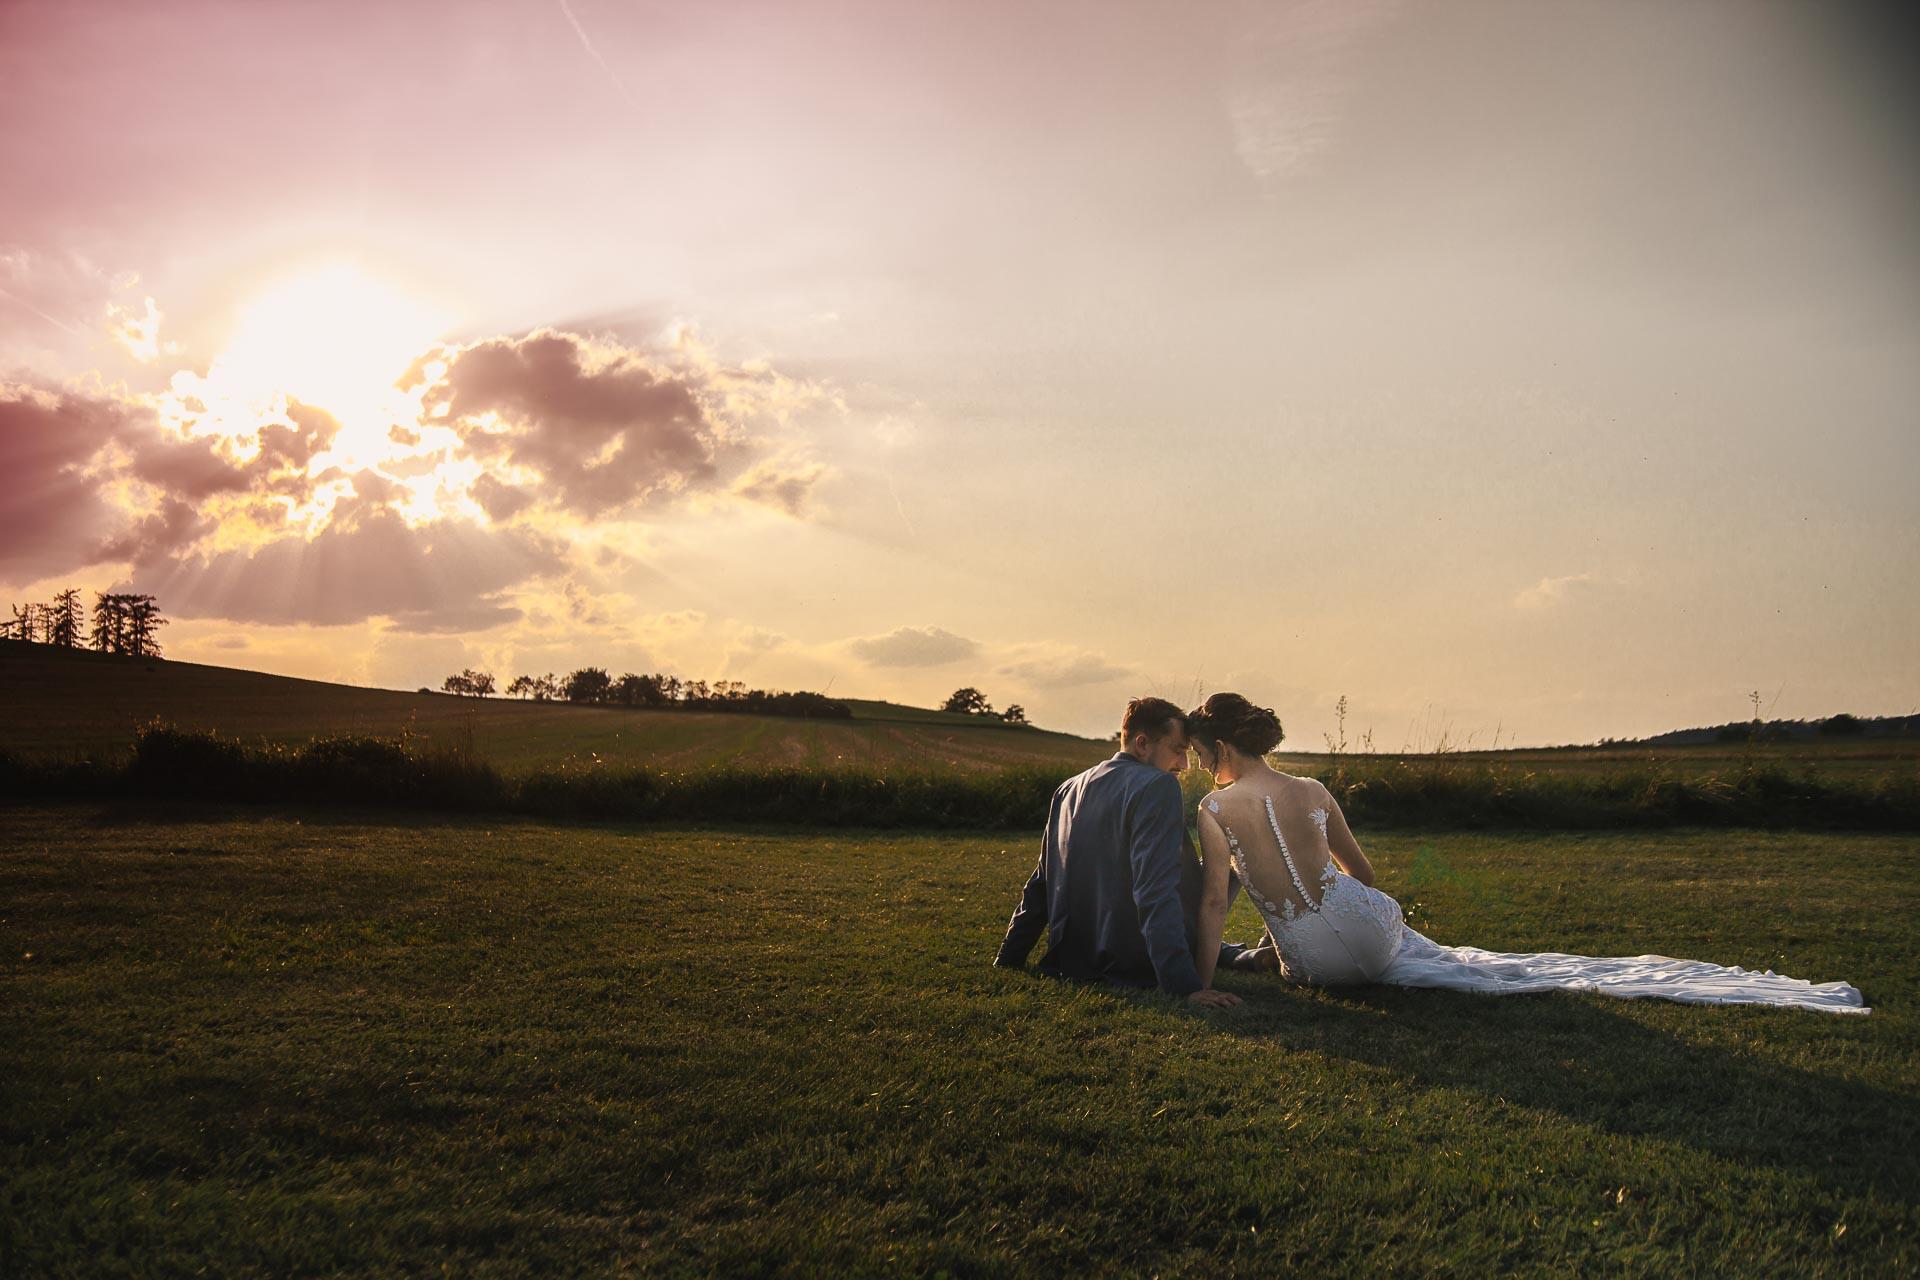 svatební-fotograf-wedding-svatebni-video-orlík-vltava-kostel-statek-stodola-boho-svatba-Beautyfoto-530